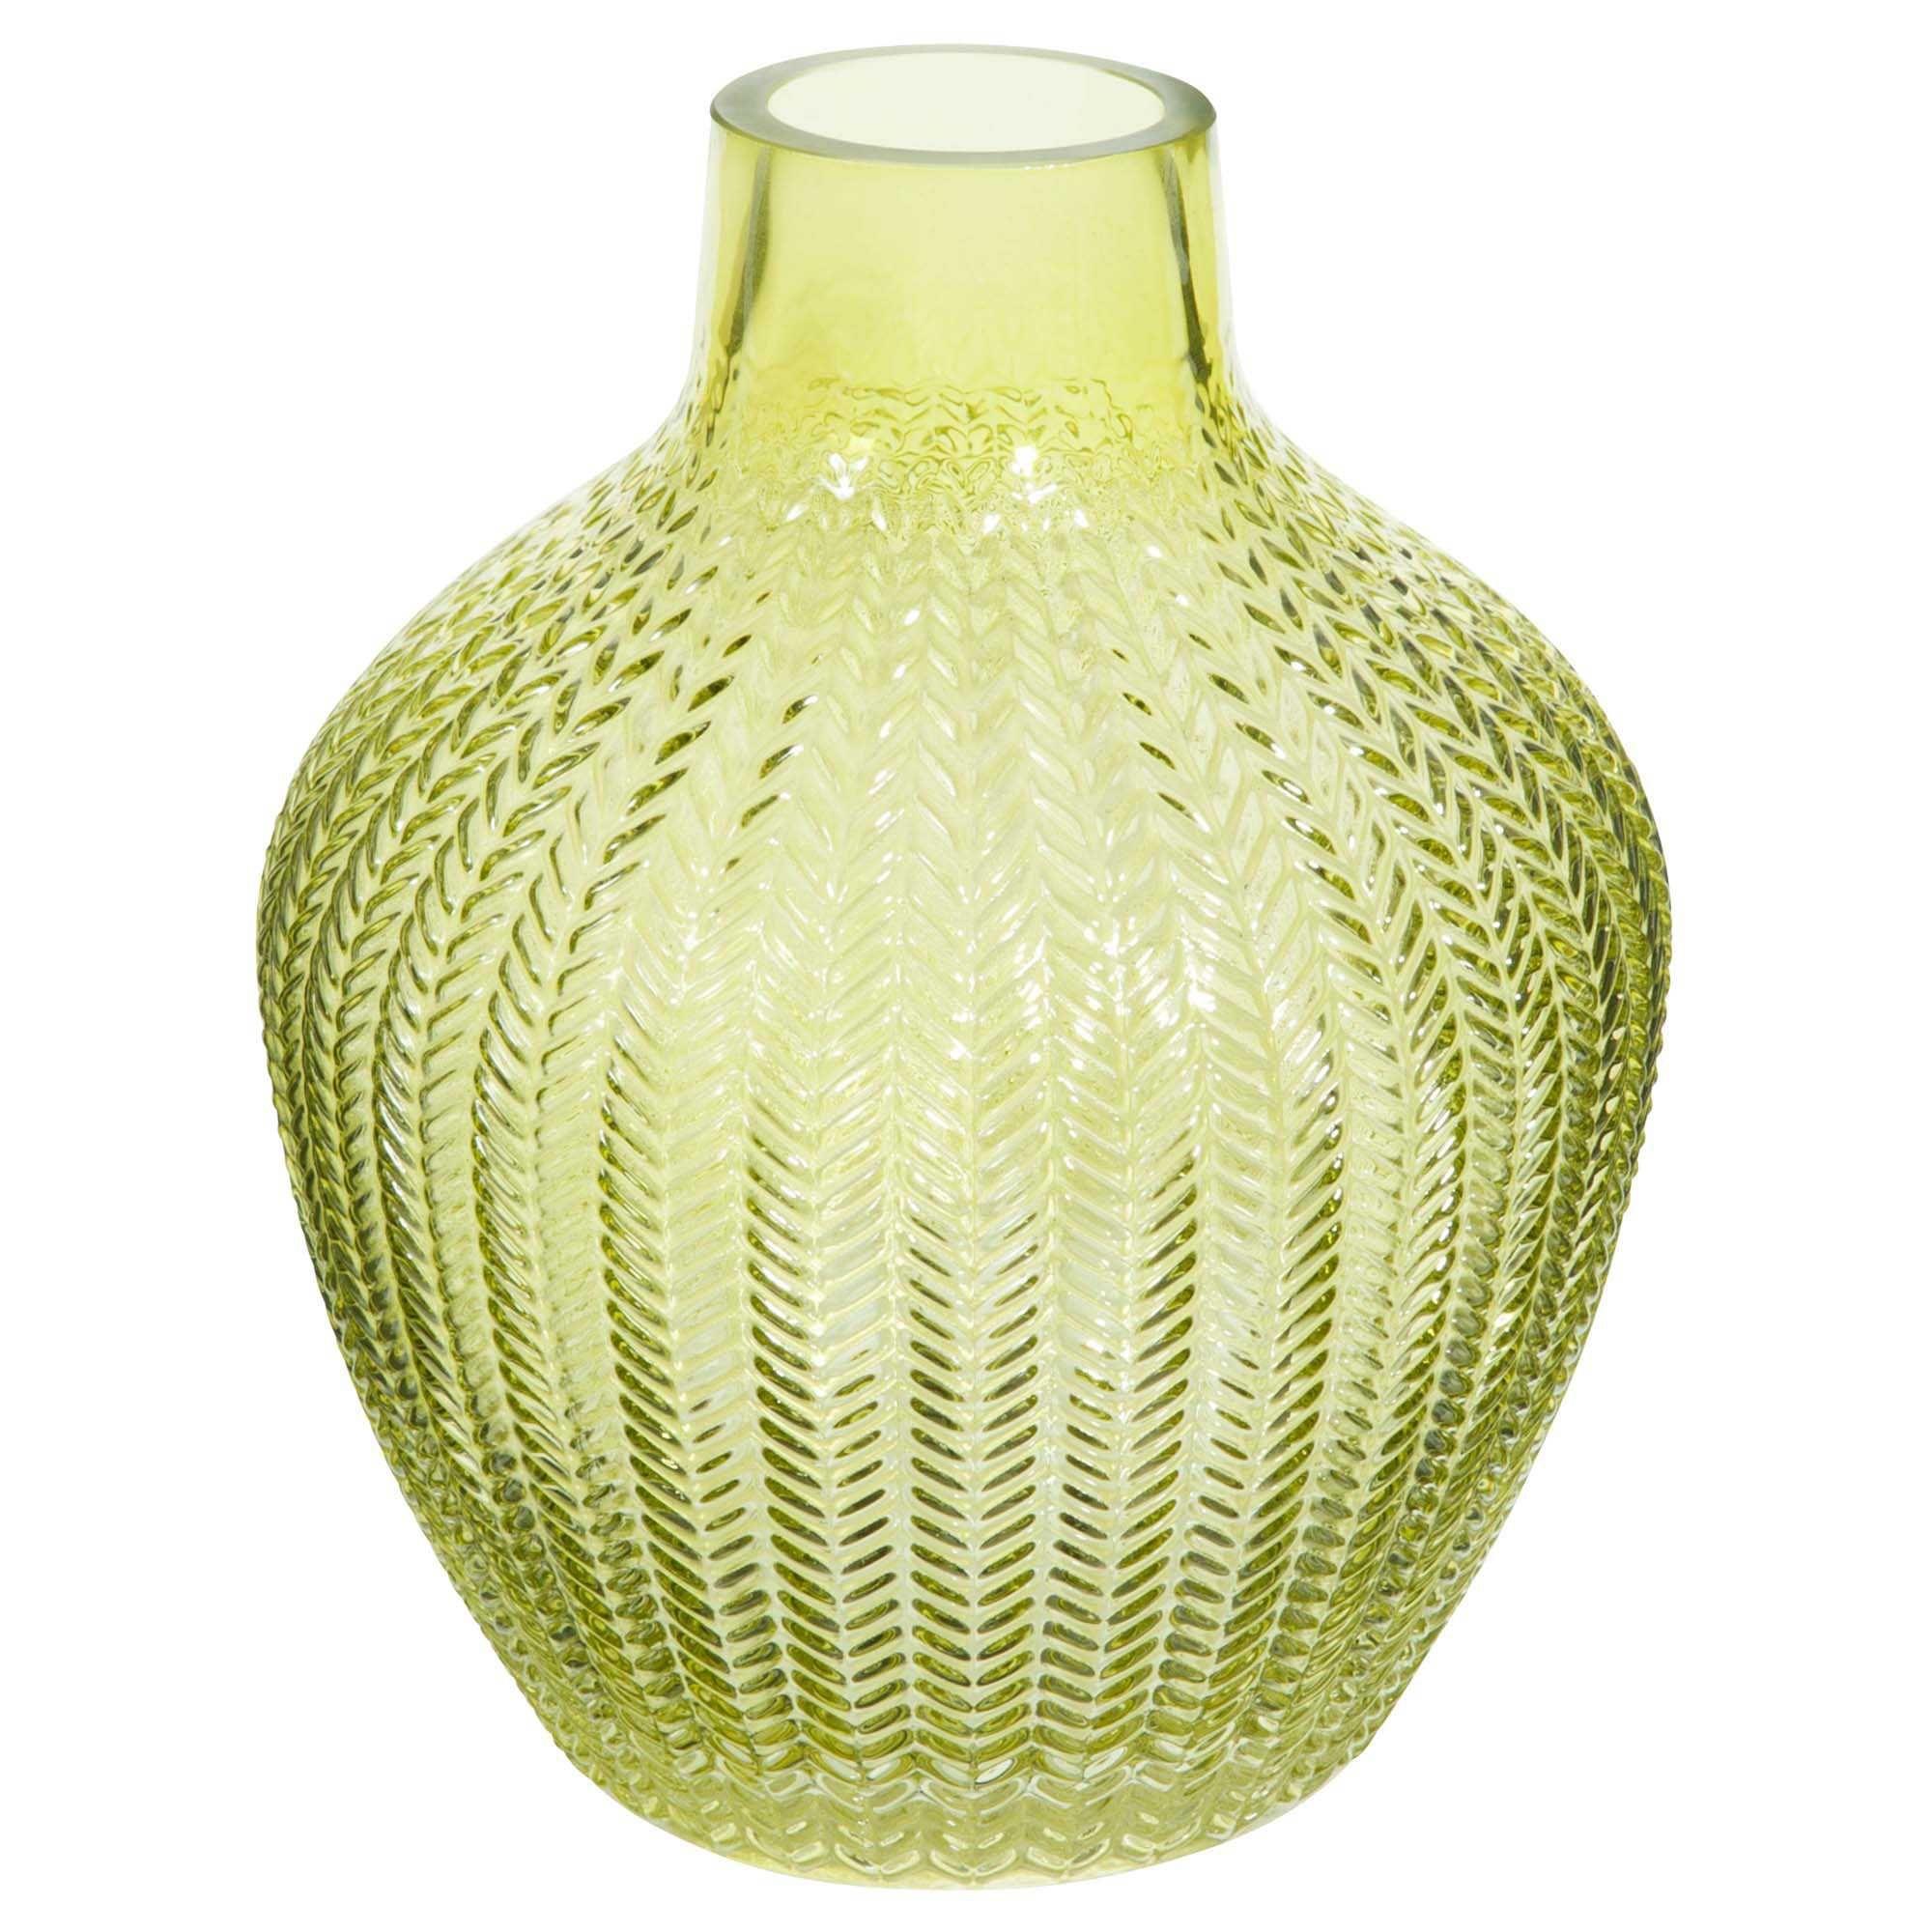 jarron cristal jarron con cristales jarrn de cristal liso cm pcs cm colgantes de cristal de. Black Bedroom Furniture Sets. Home Design Ideas